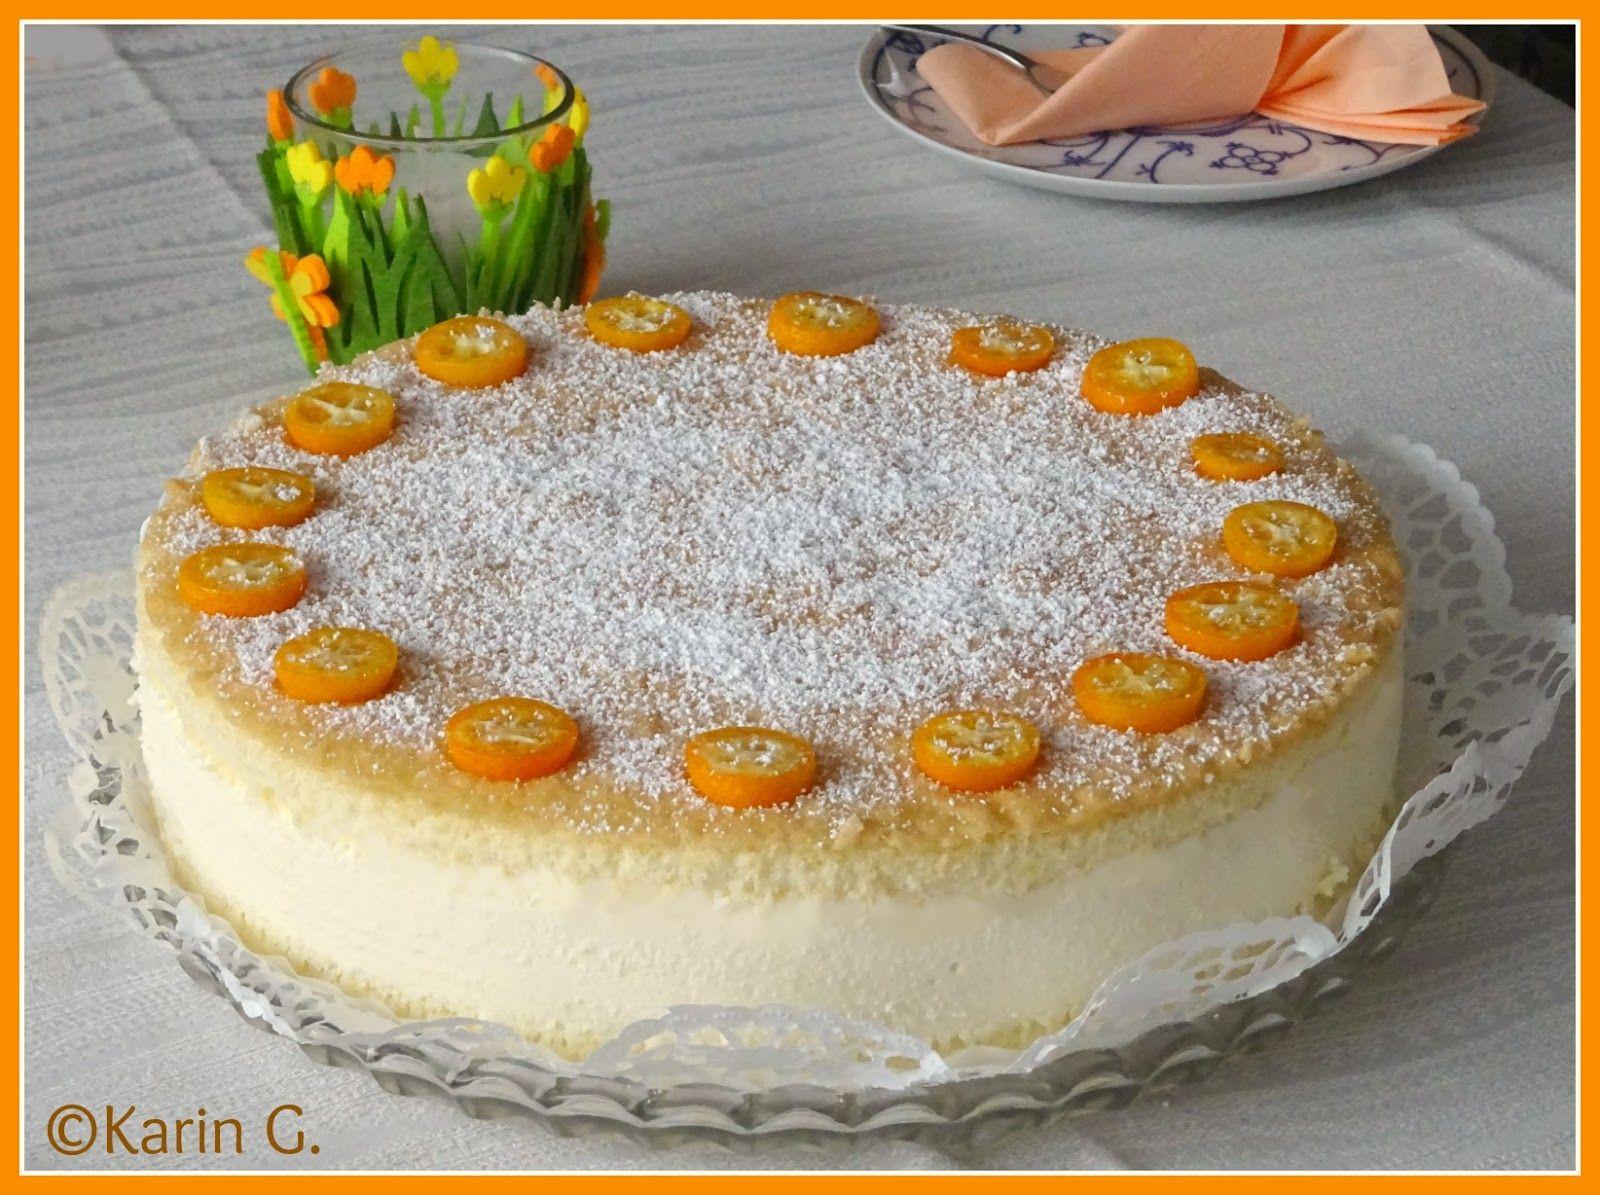 Kasesahnetorte Kasesahne Sahnetorte Kase Quark Torte Kasesahne